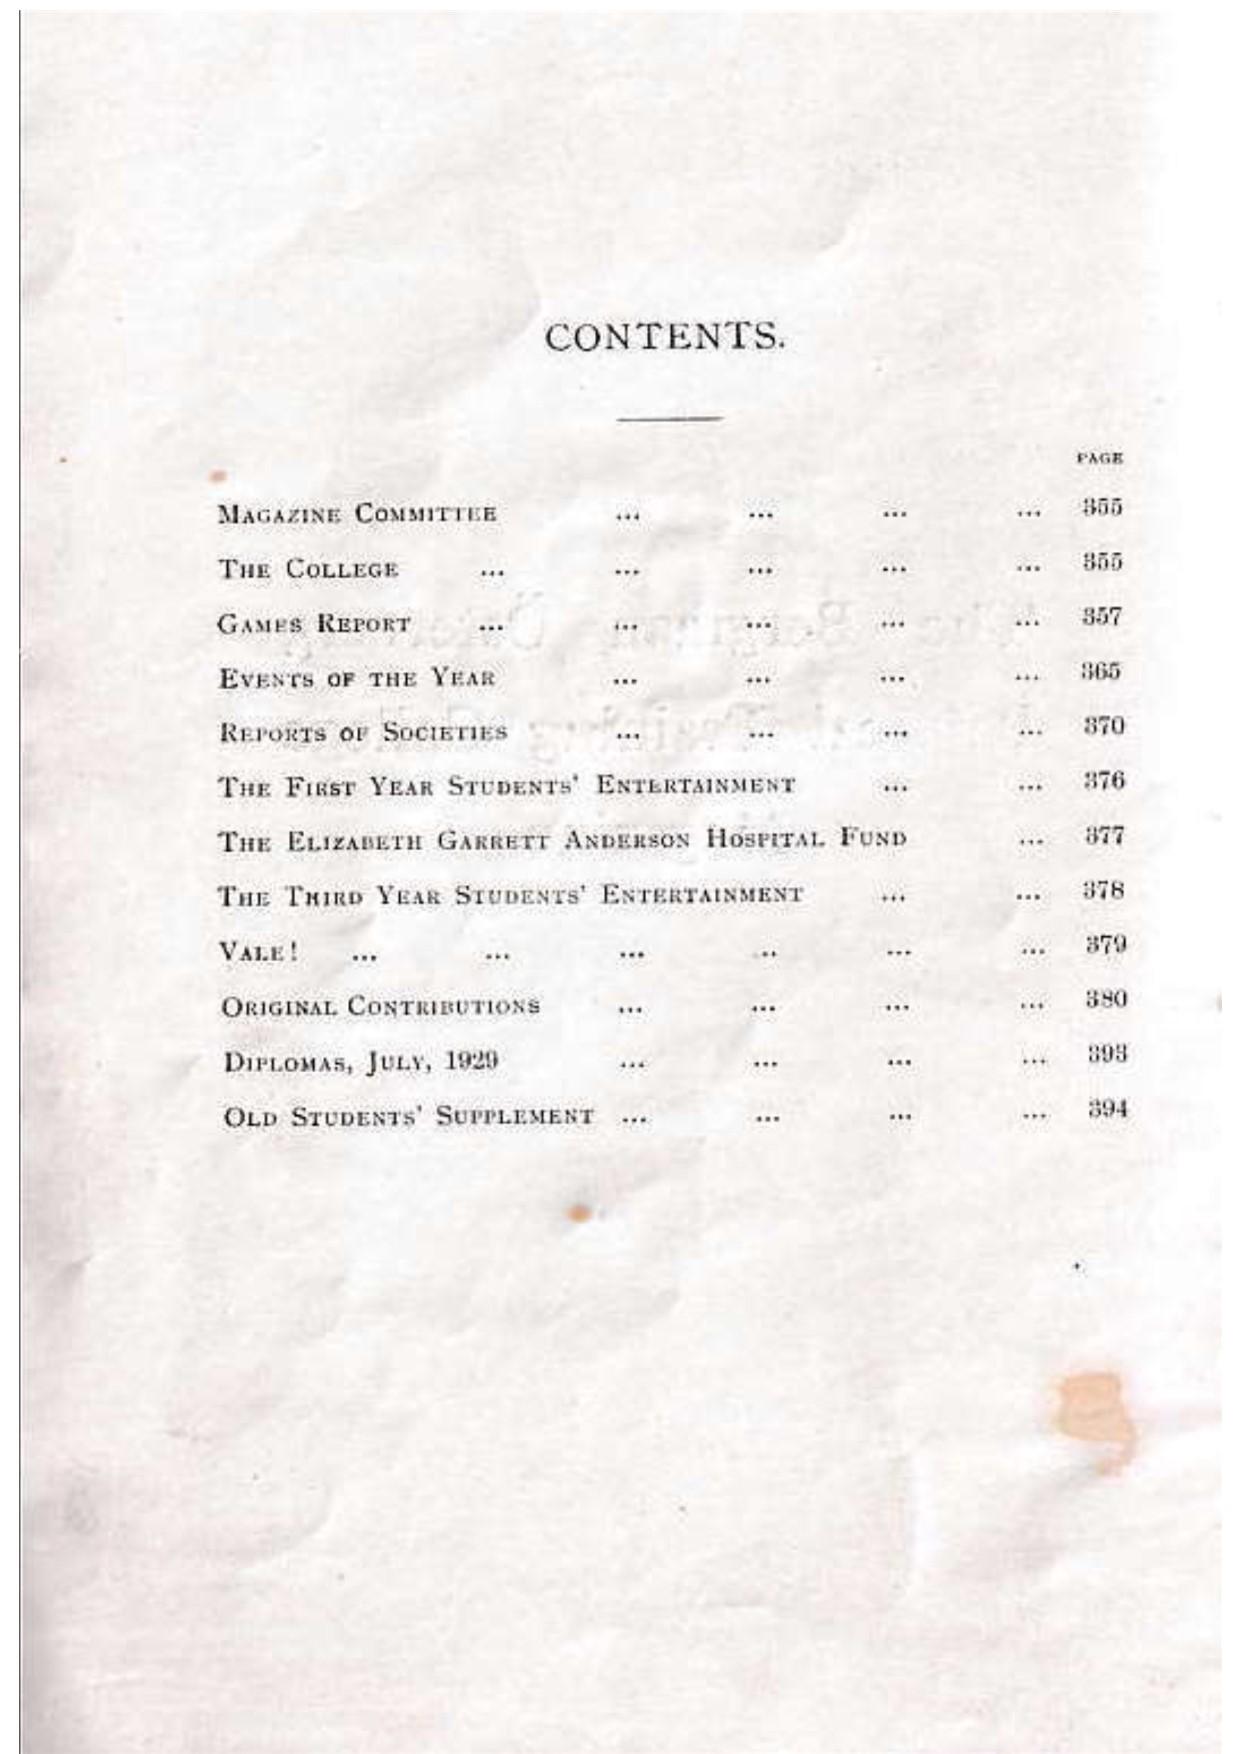 BOPTC 1929 Contents